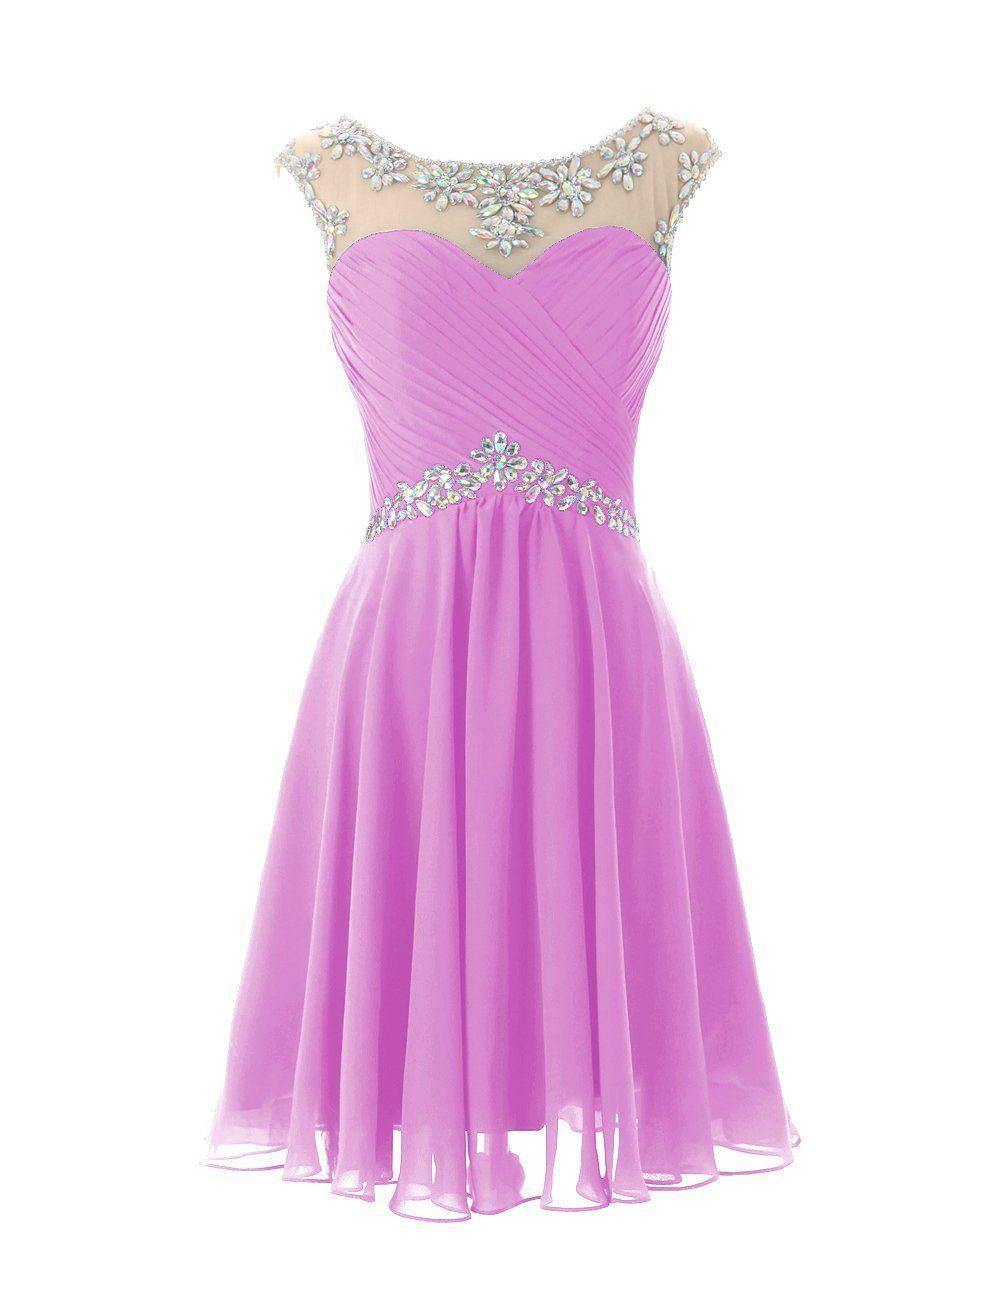 b91301b924ab7 Dresstells® Short Prom Dresses Sexy Homecoming Dress for Juniors ...